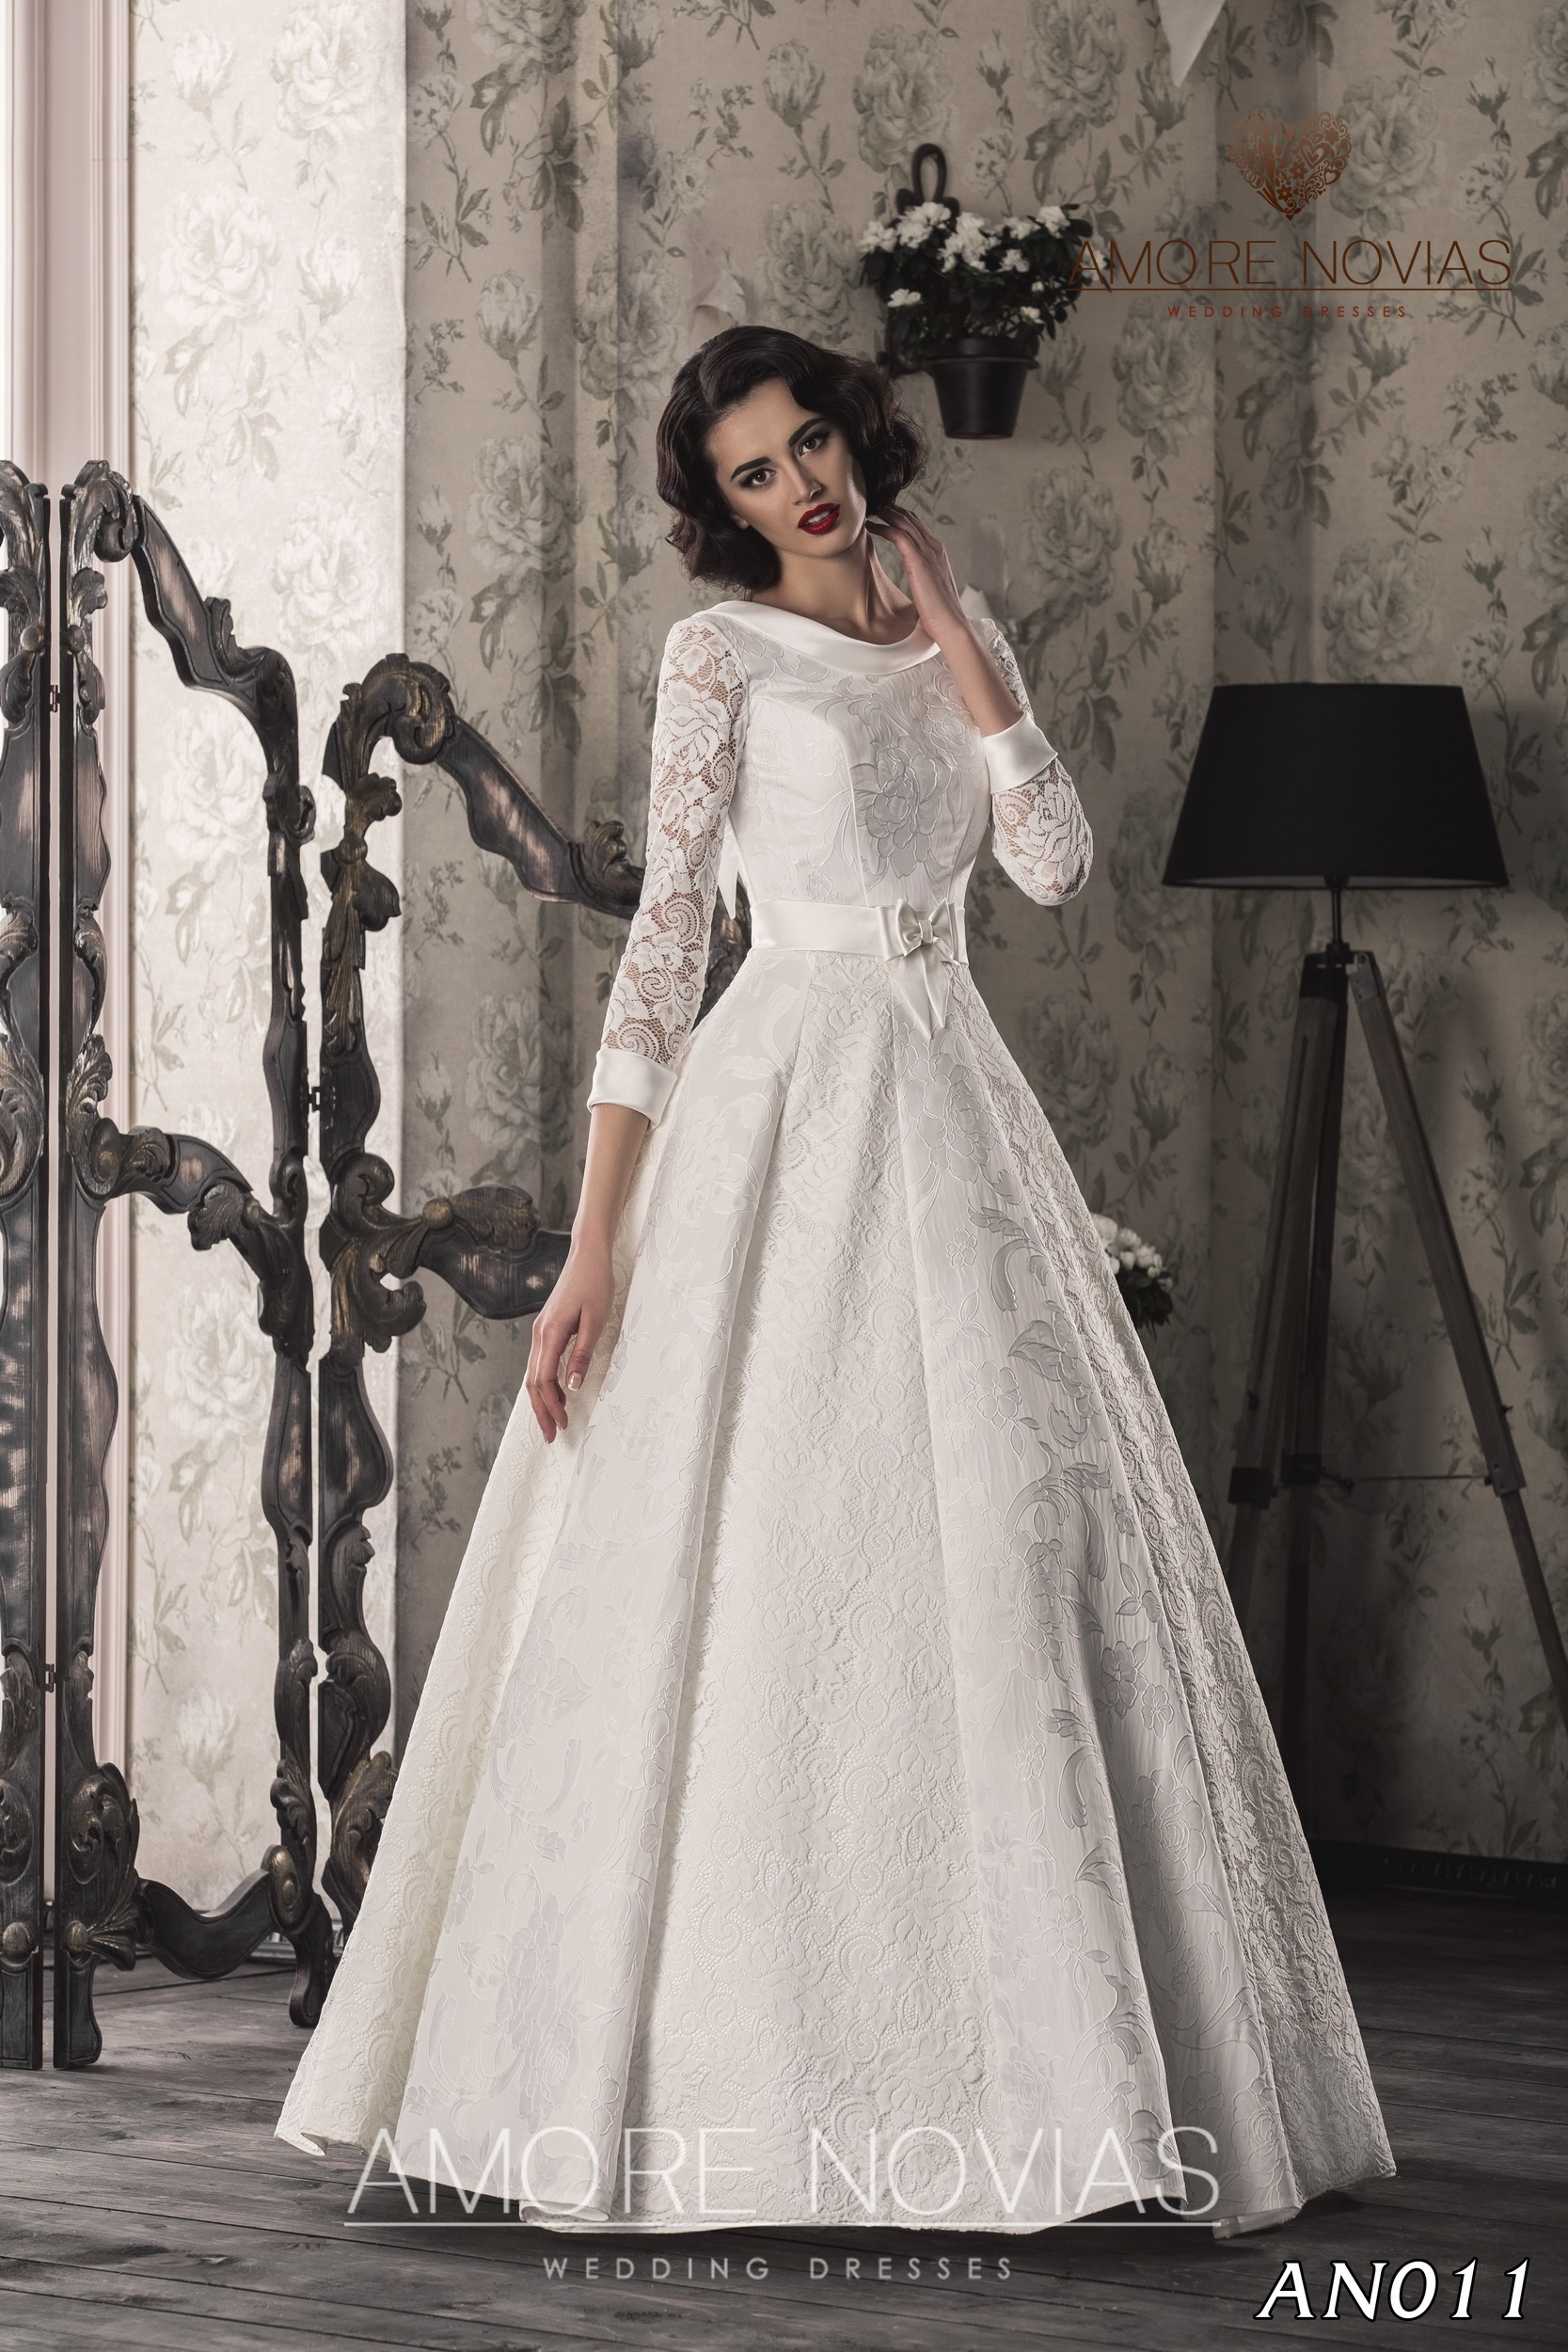 http://amore-novias.com/images/stories/virtuemart/product/an011.jpg